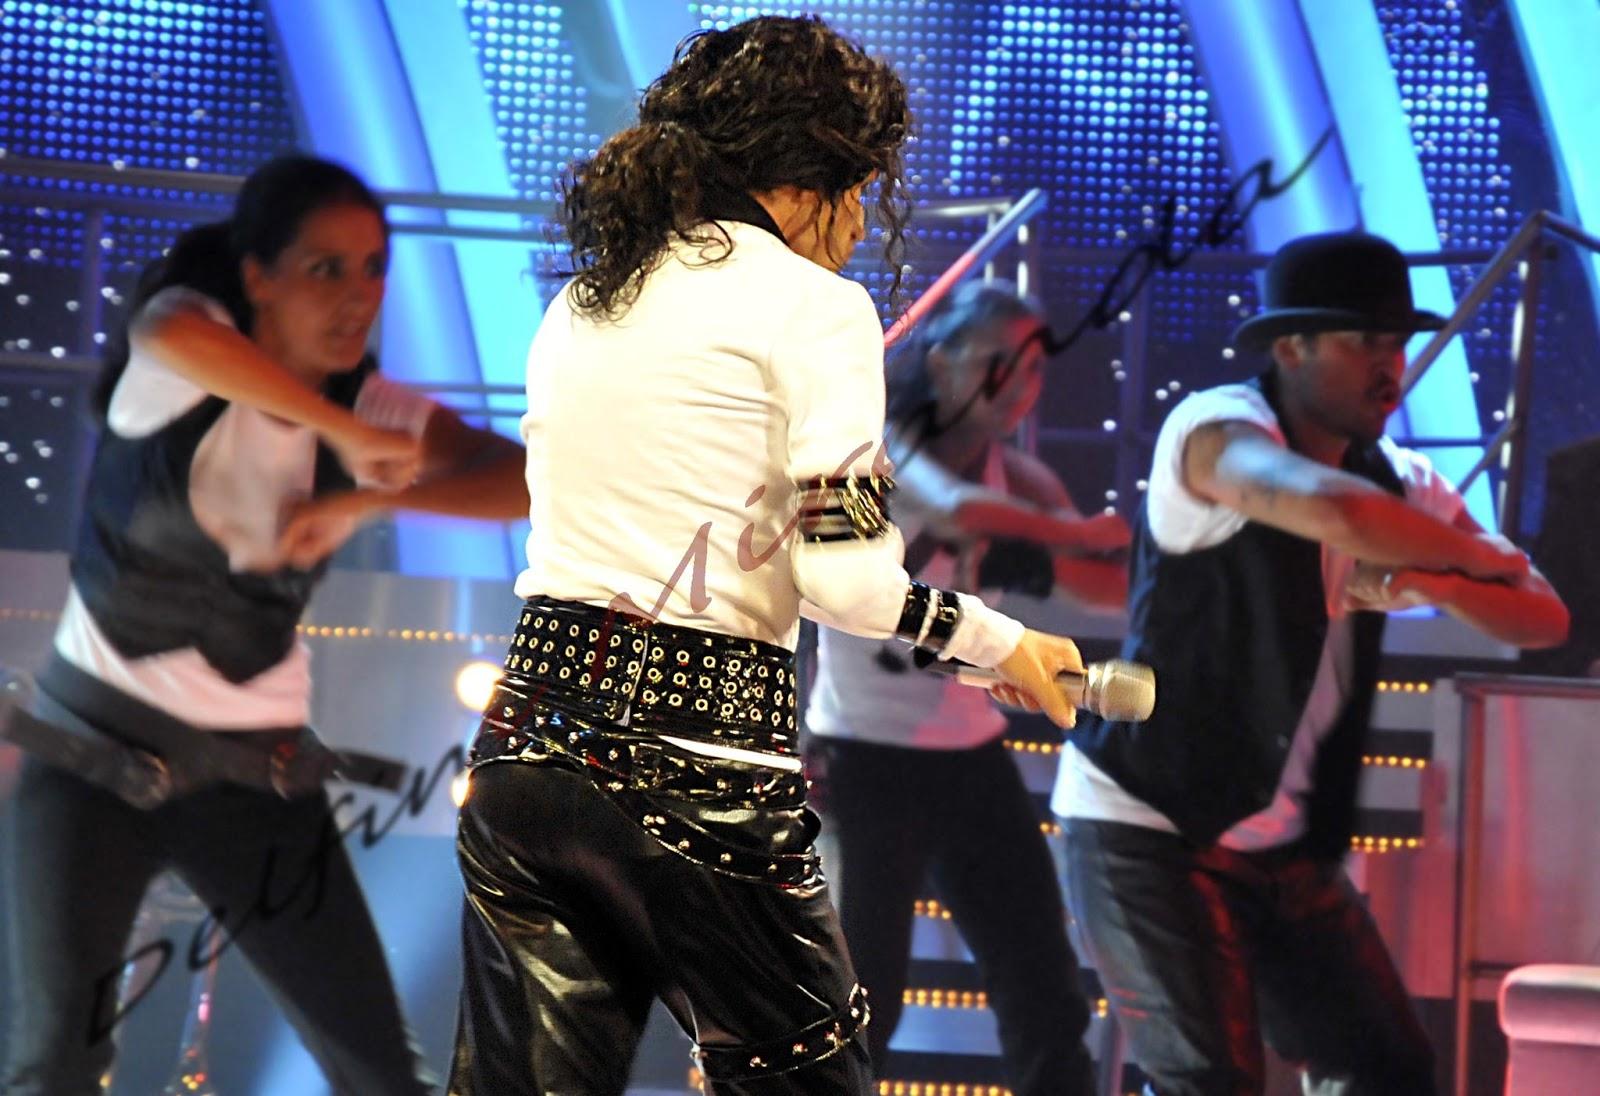 Delfim Miranda - Michael Jackson Tribute - Bad - Live on TV - TVI / Endemol